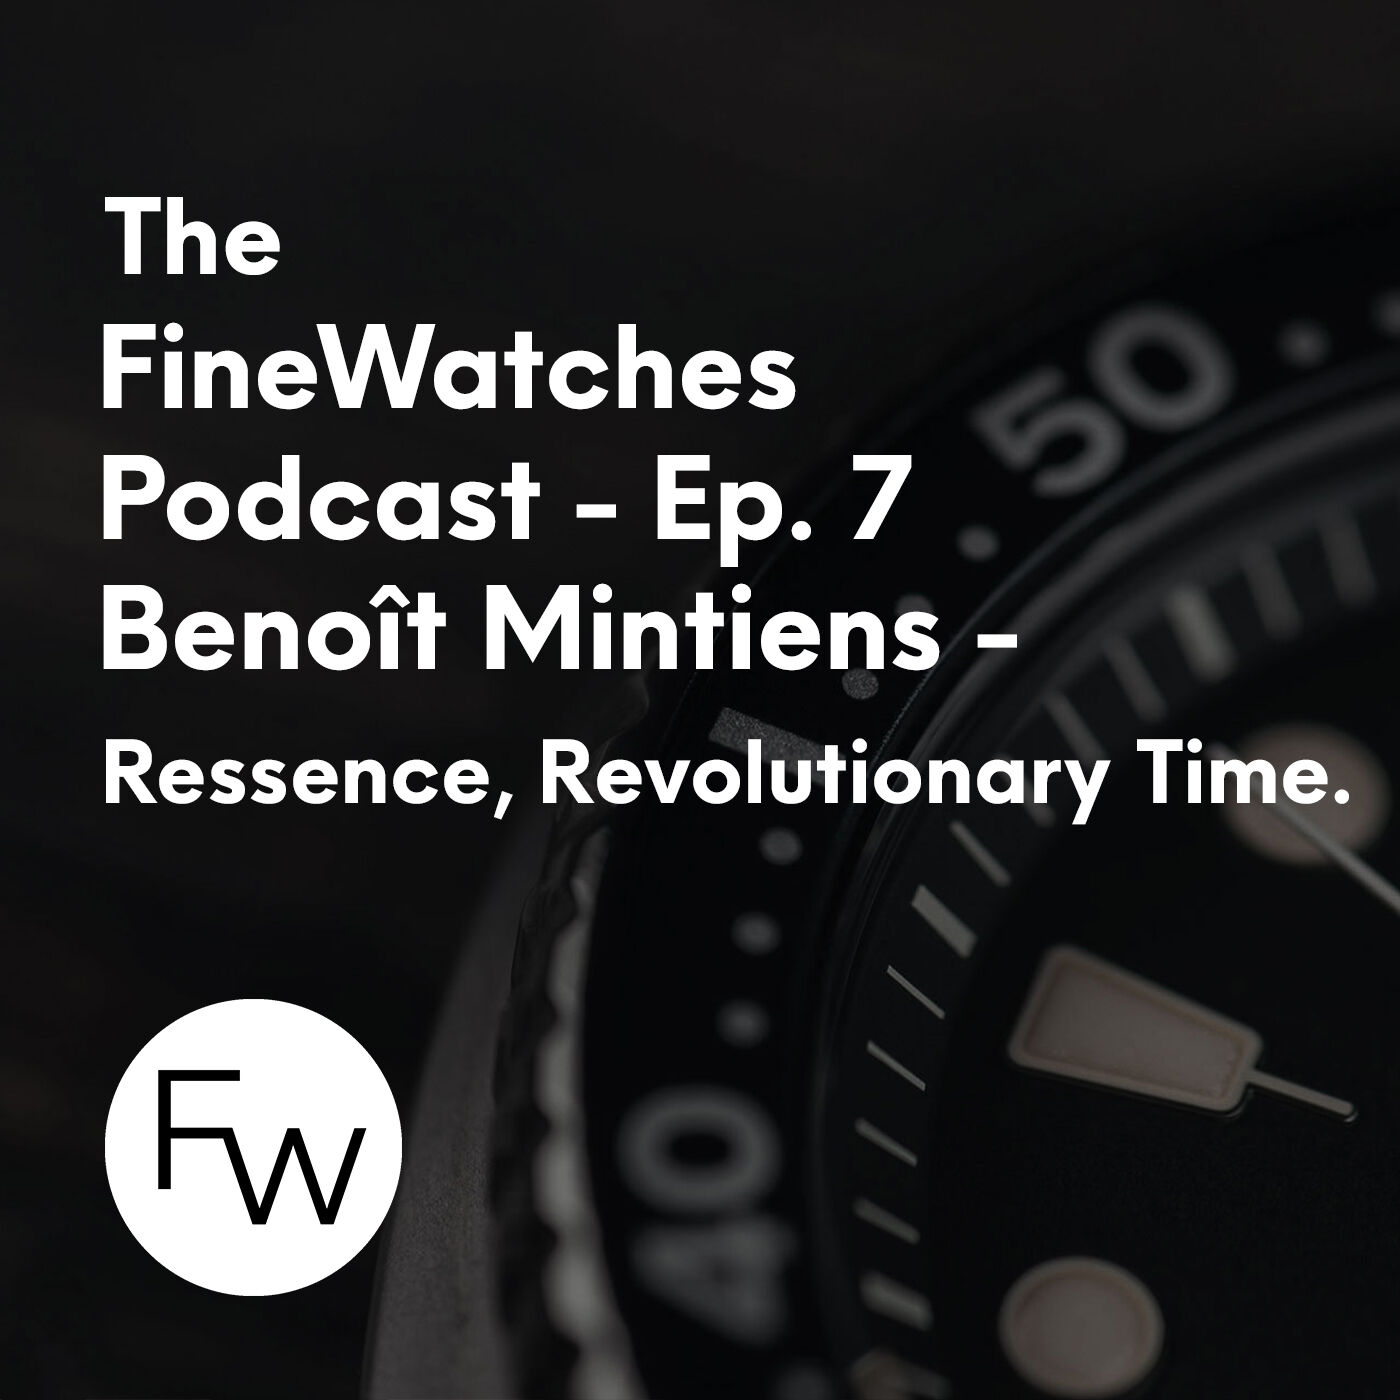 Ressence, Revolutionary Time. - Benoît Mintiens.